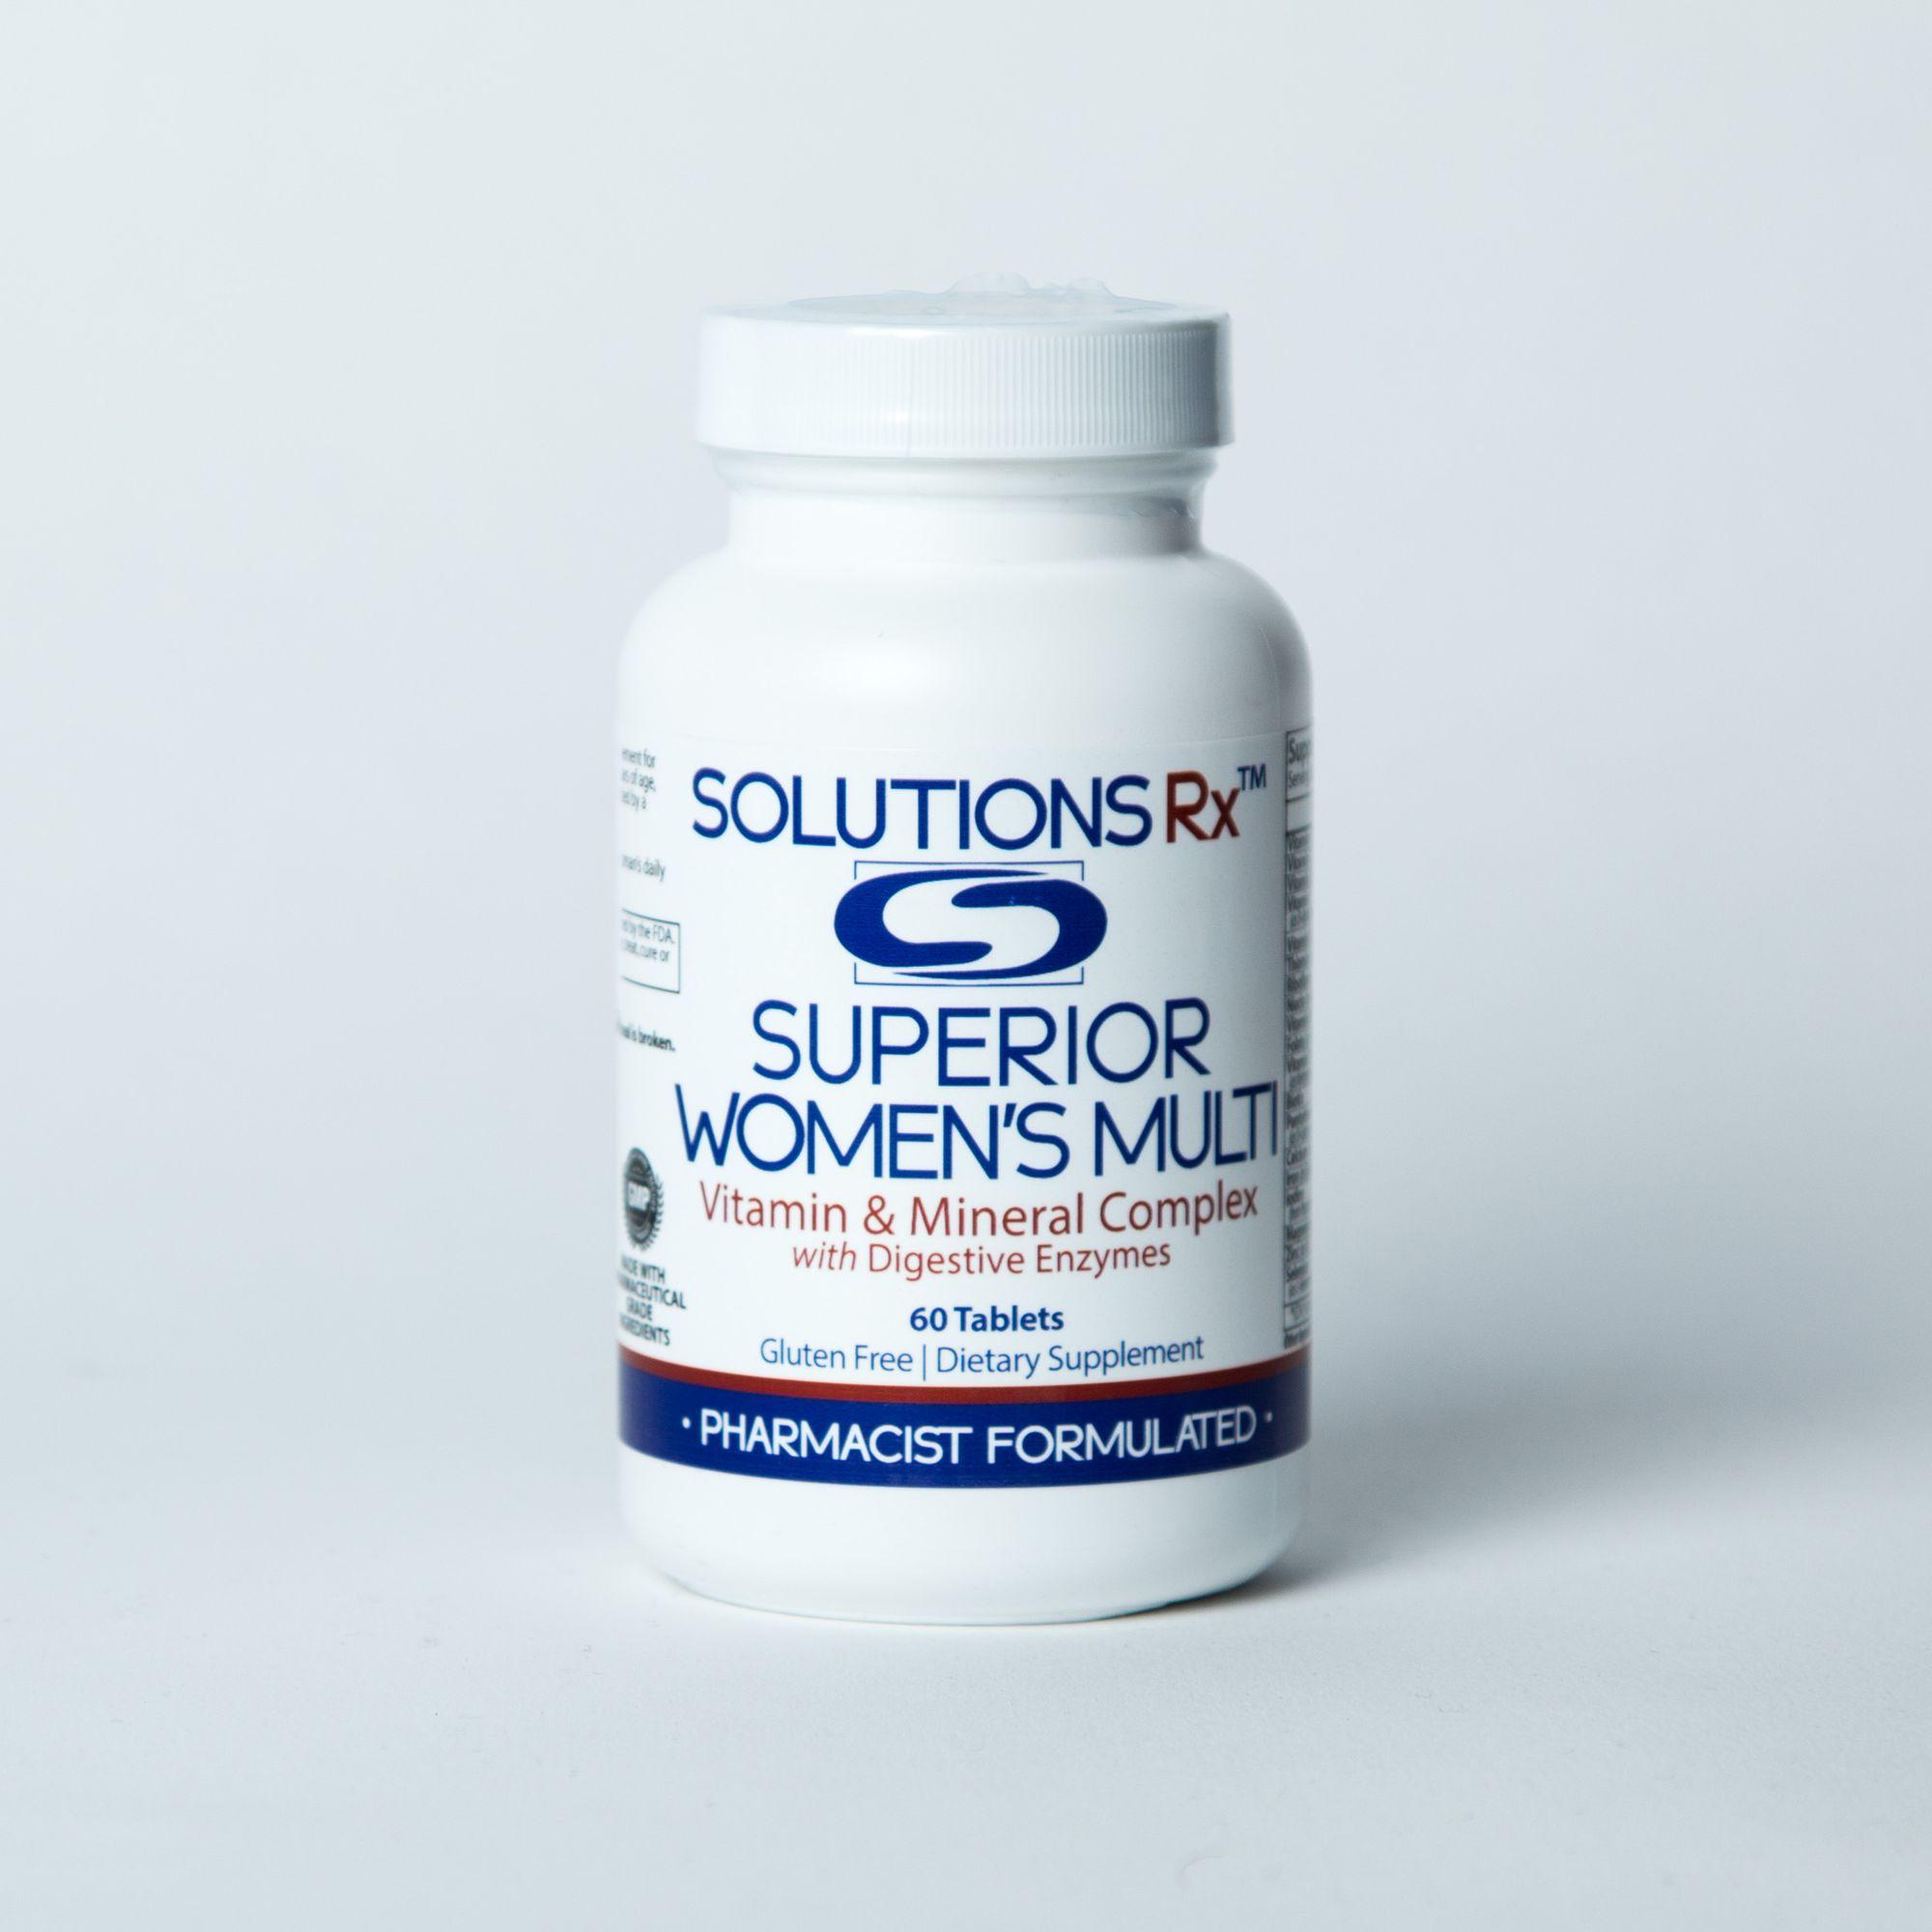 SolutionsRX_Superior_Womens_Multi_Vitamin_60ct.jpg